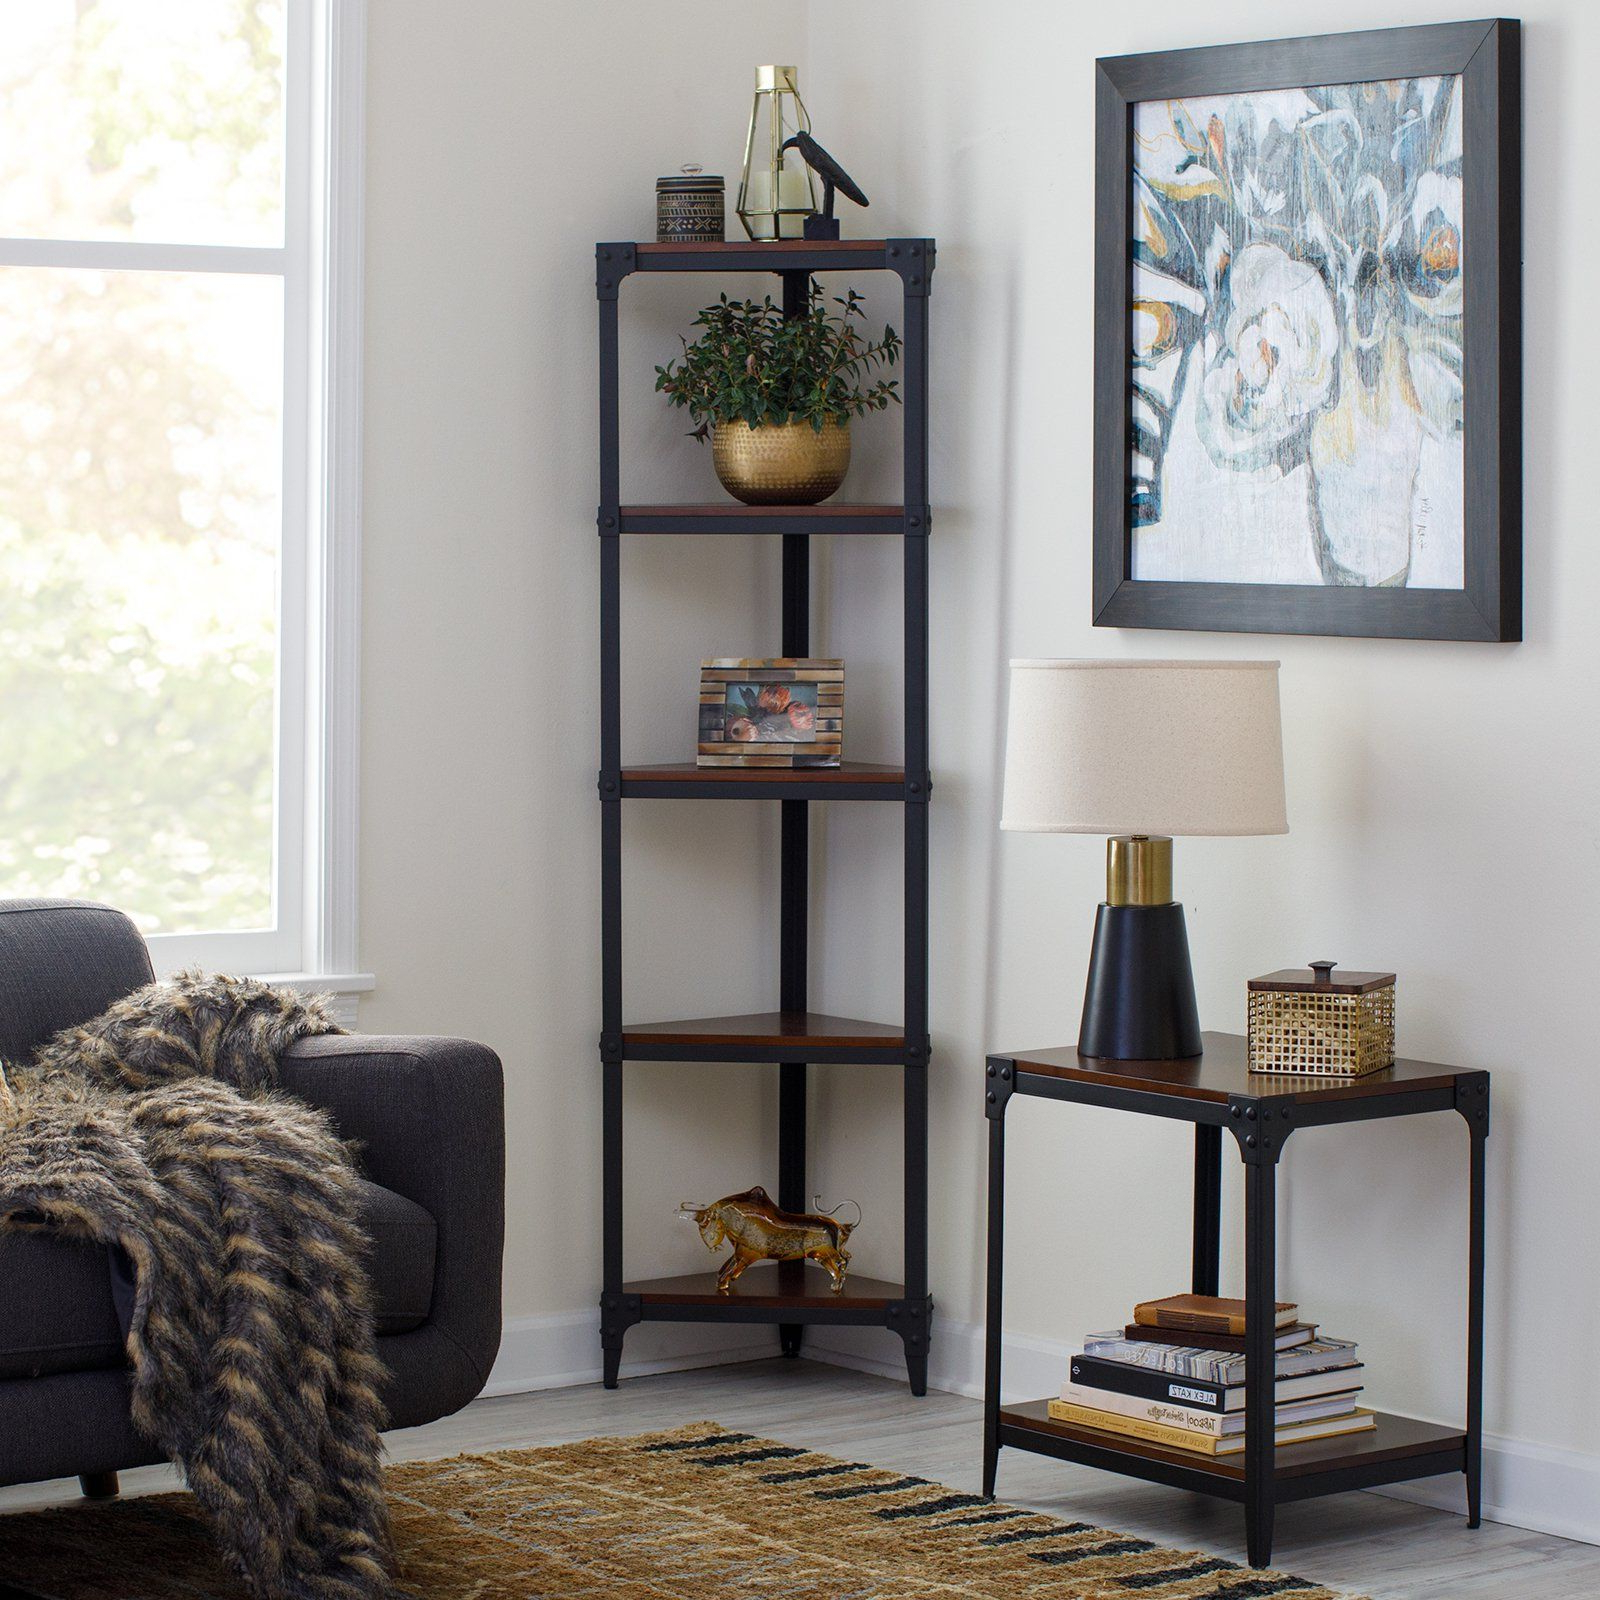 Belham Living Trenton Corner Bookcase In 2019 (Gallery 9 of 20)